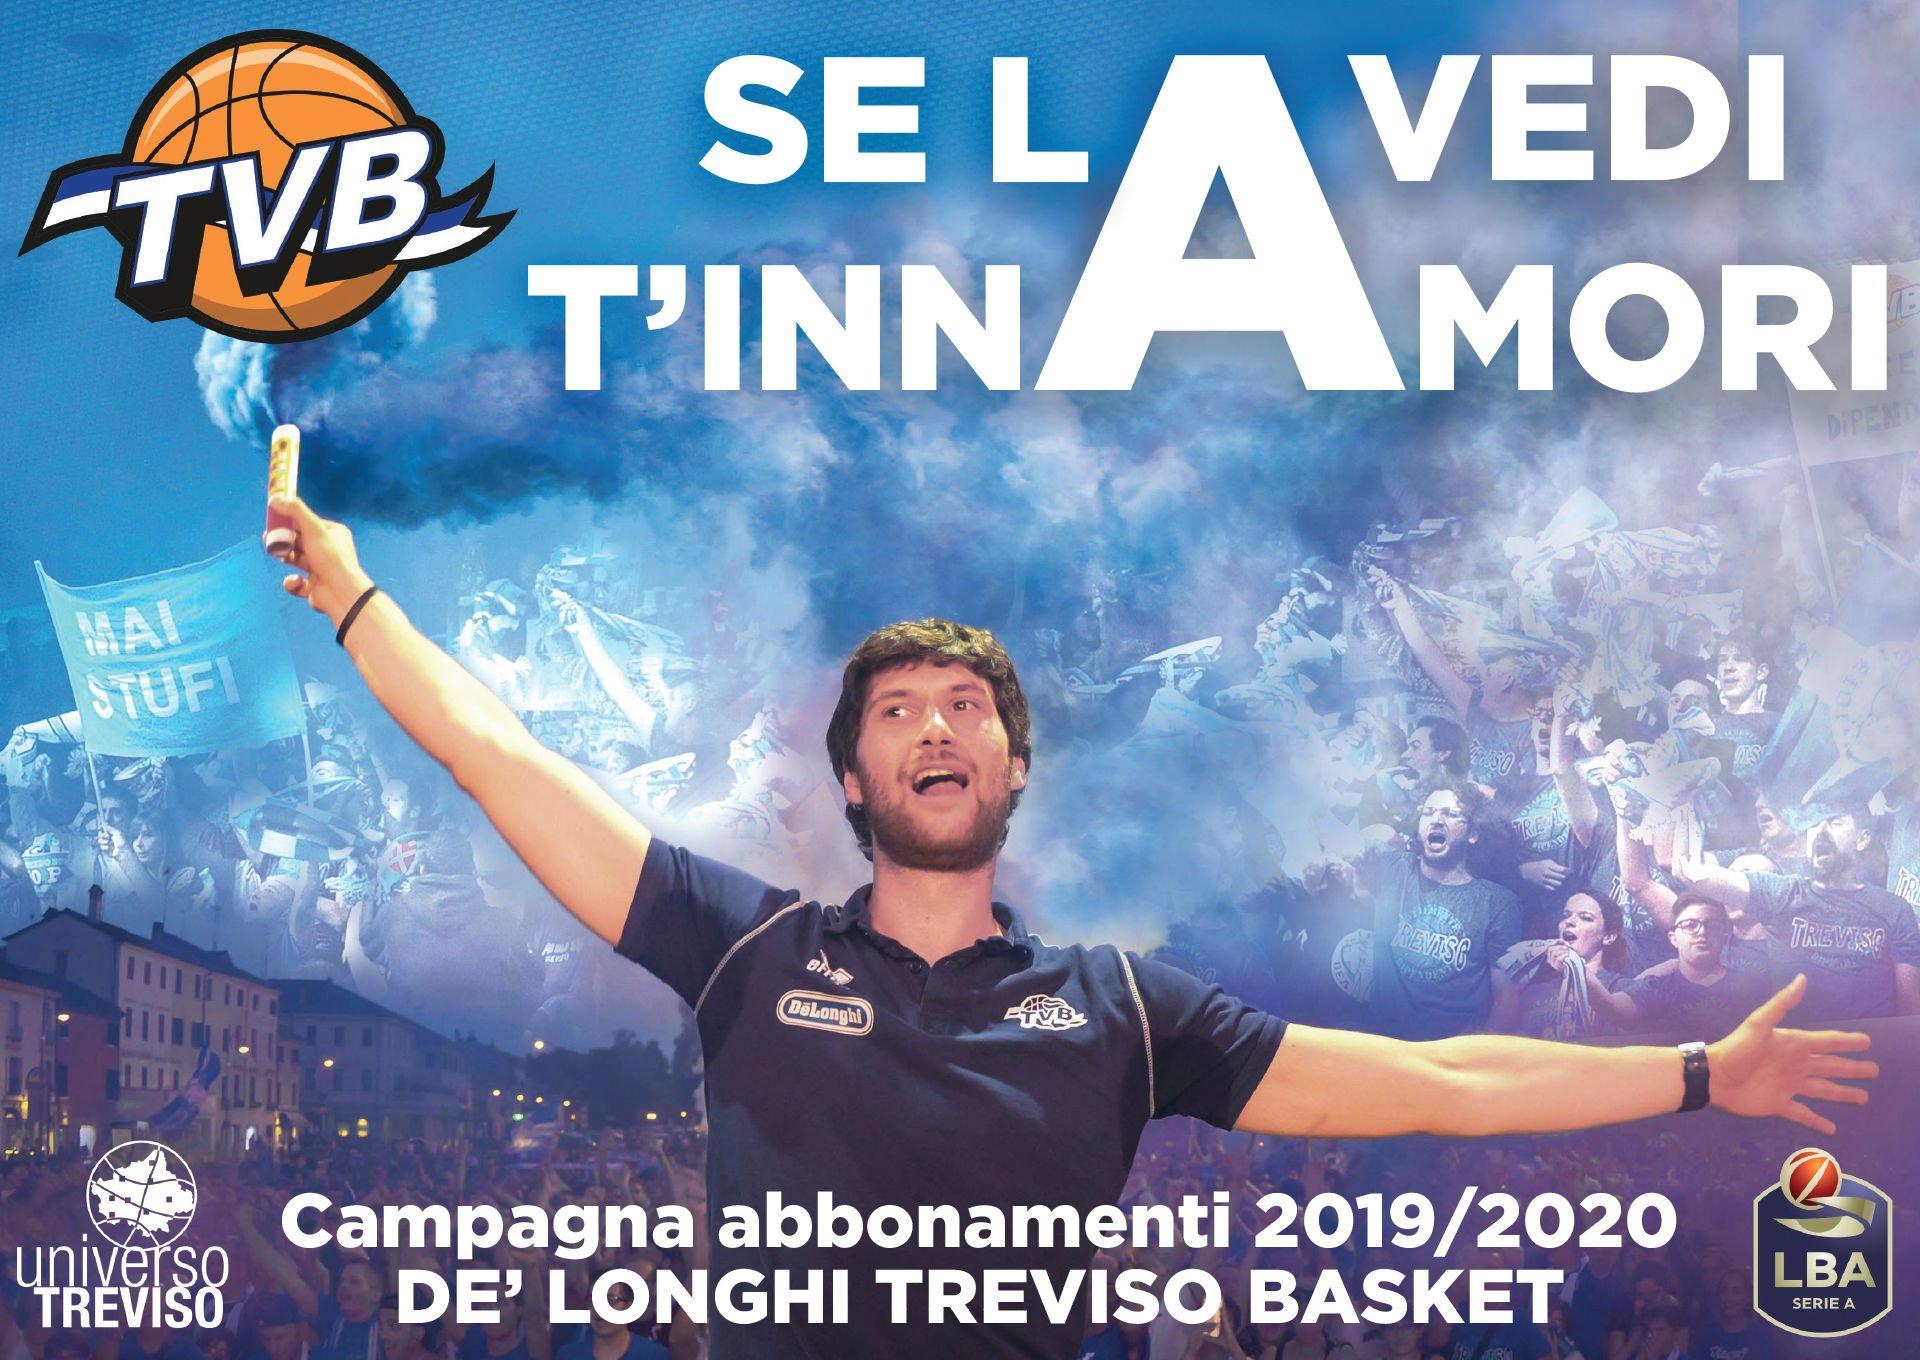 Treviso Basket Calendario.Treviso Basket Sito Ufficiale Della De Longhi Universo